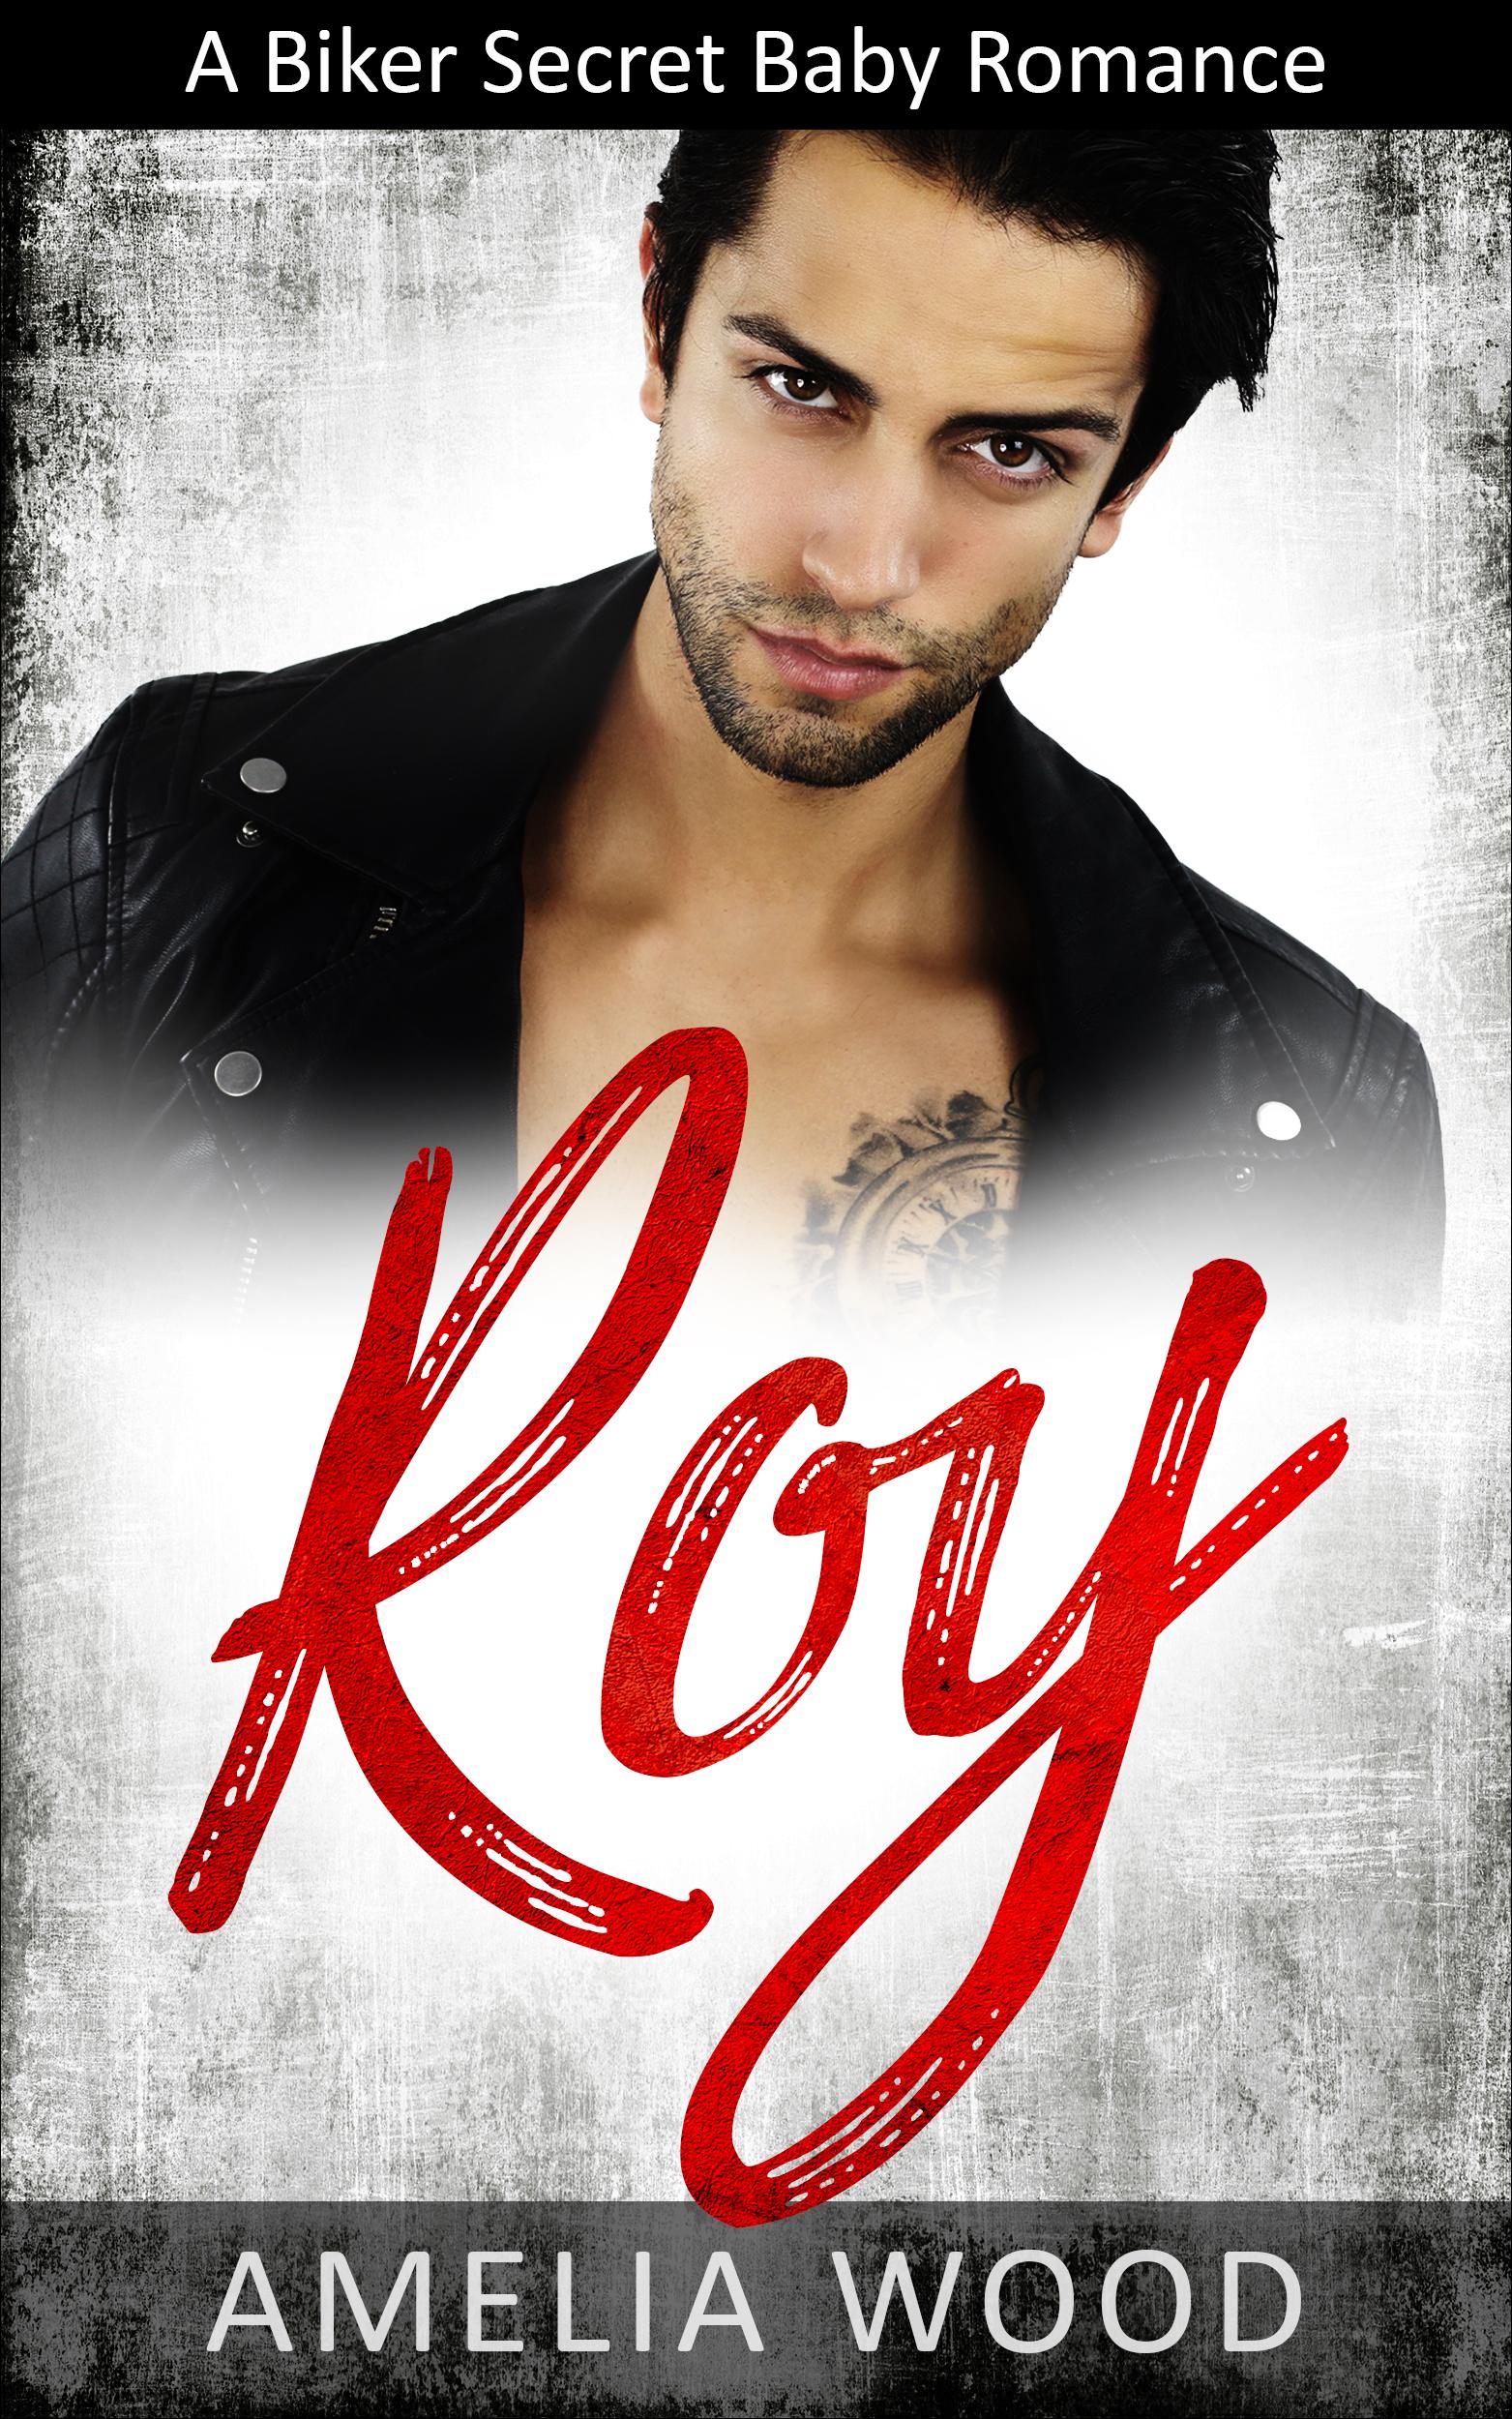 Roy cover.jpg